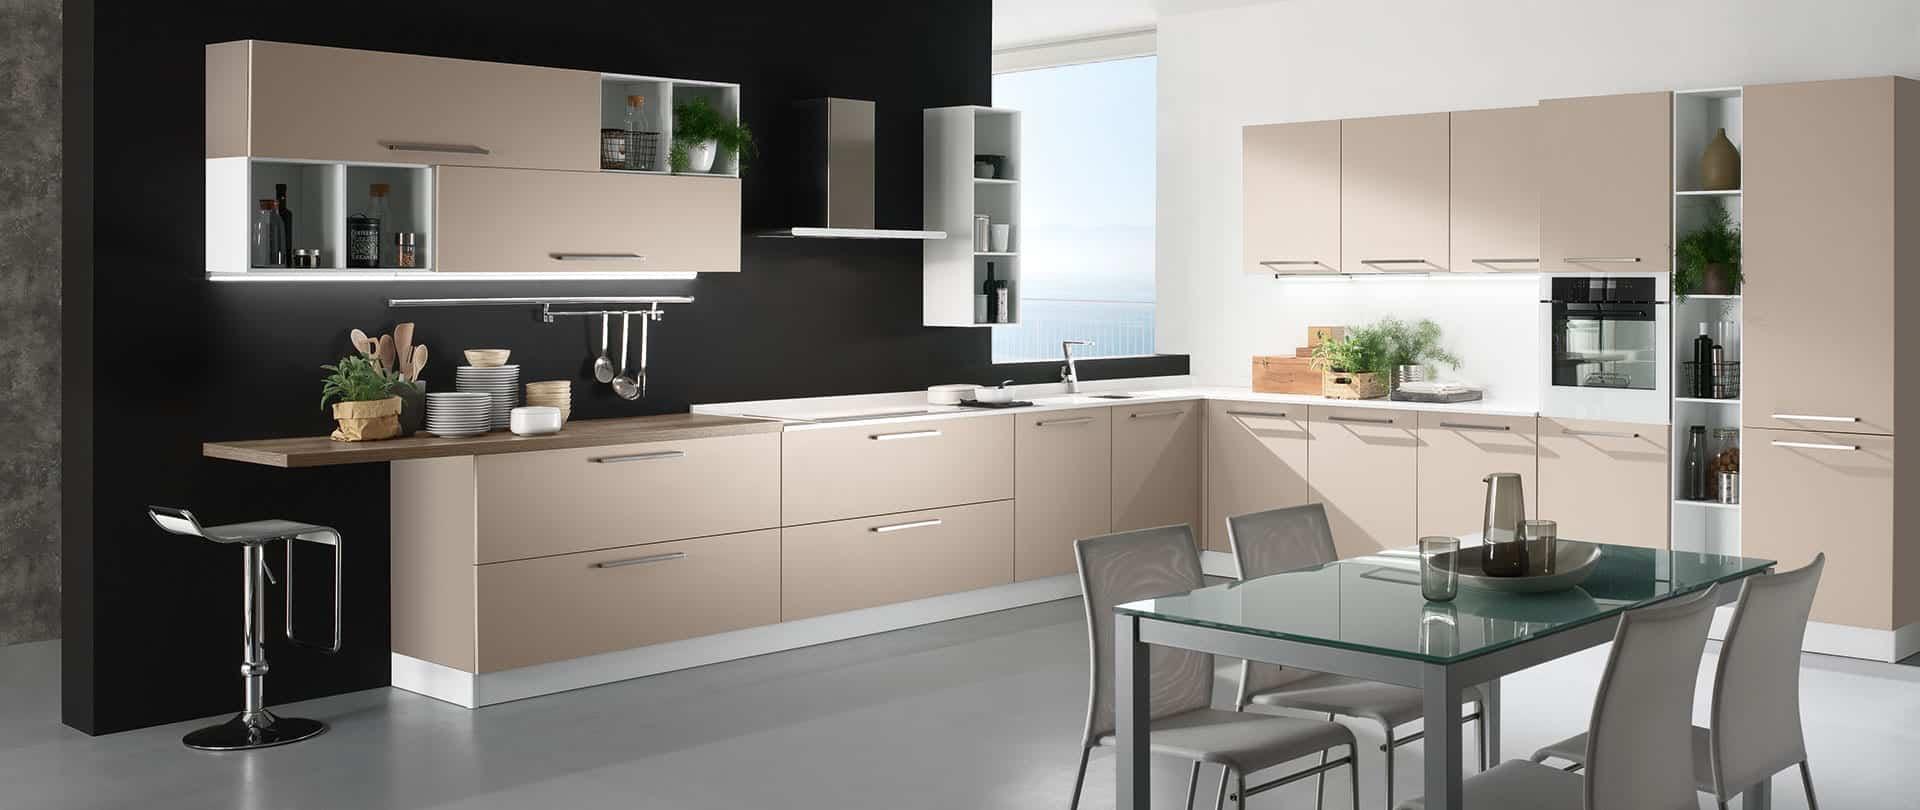 MOBILTURI Brio - Modern Italian Kitchen